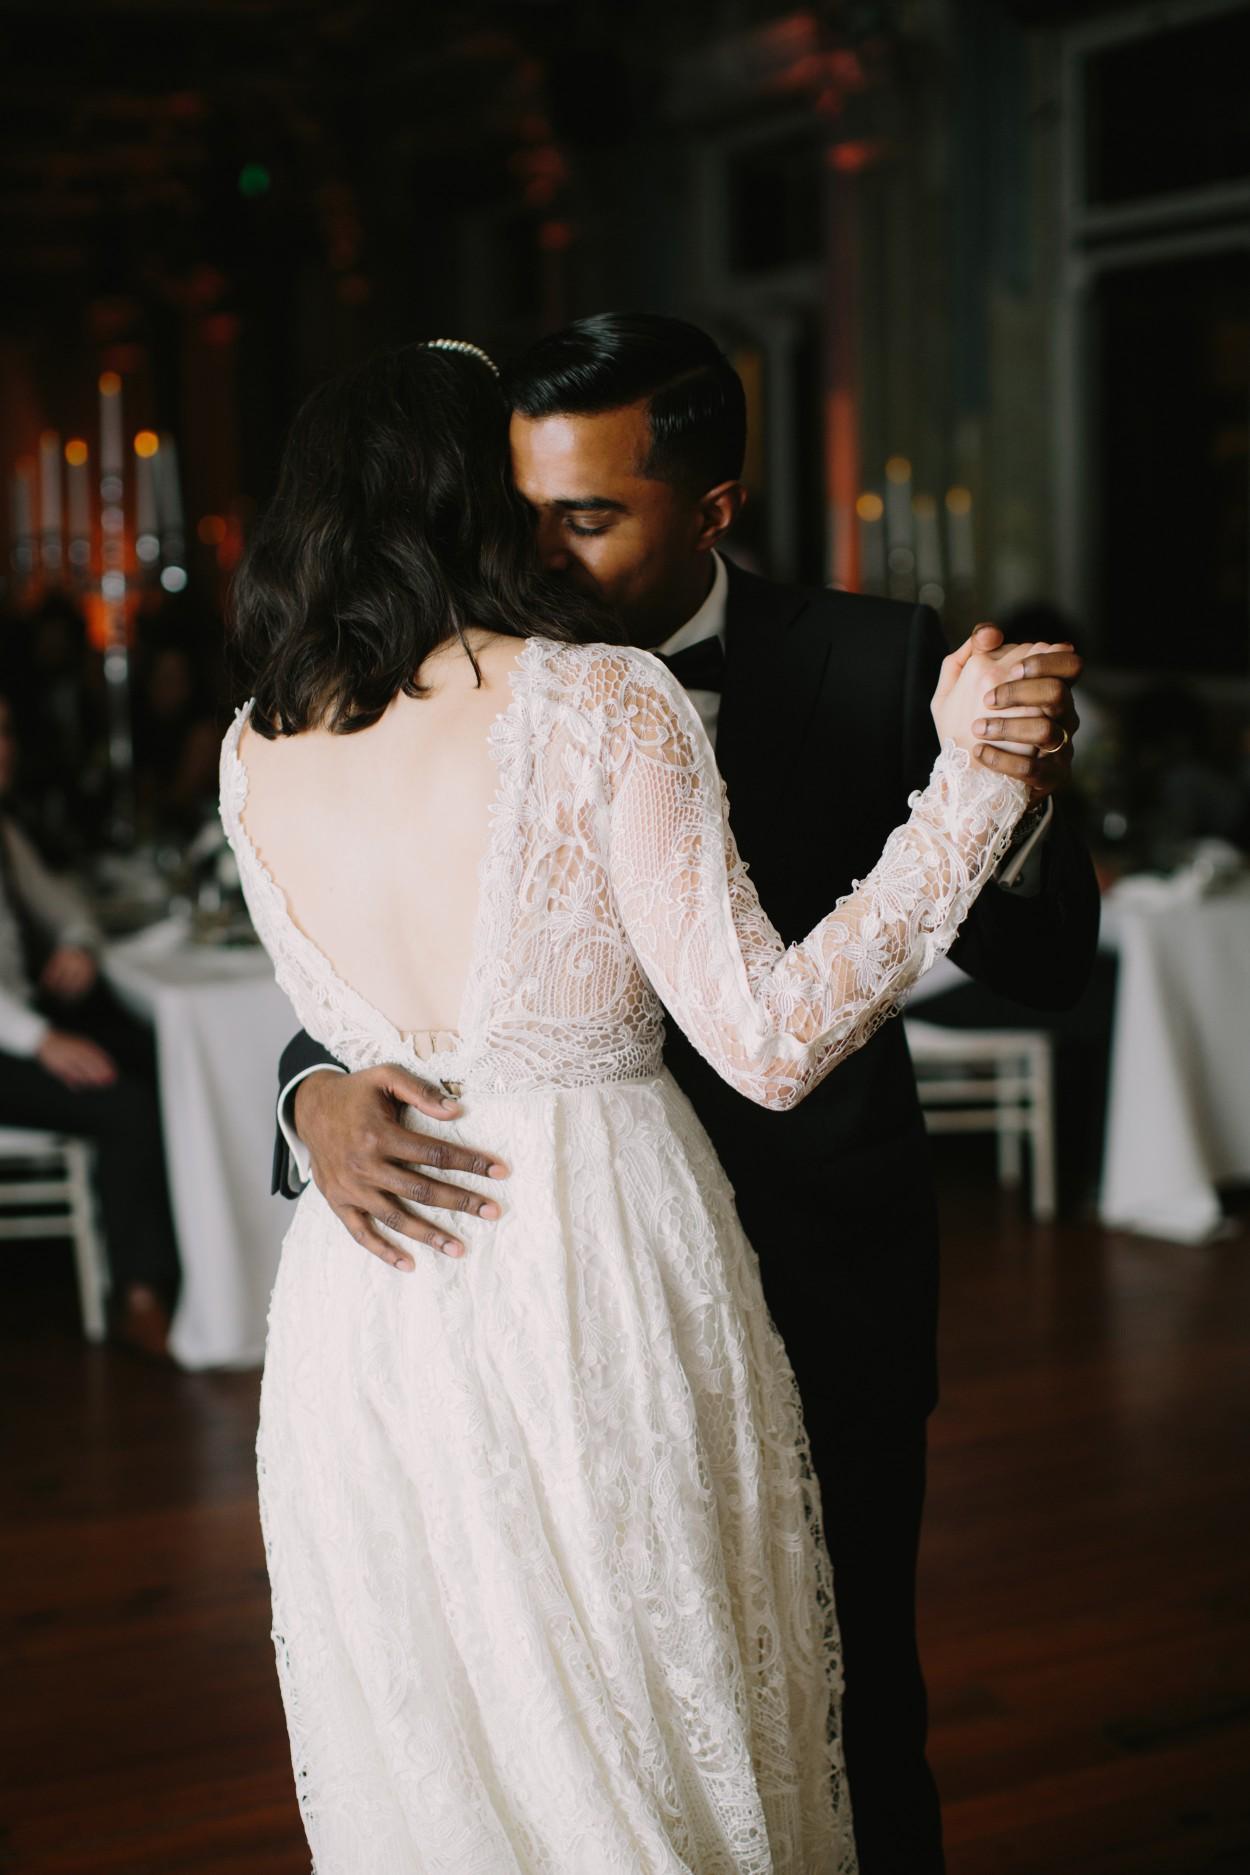 I-Got-You-Babe-Weddings-The-129George-Ballroom-St-Kilda-Wedding-Amy-Abhi.jpg